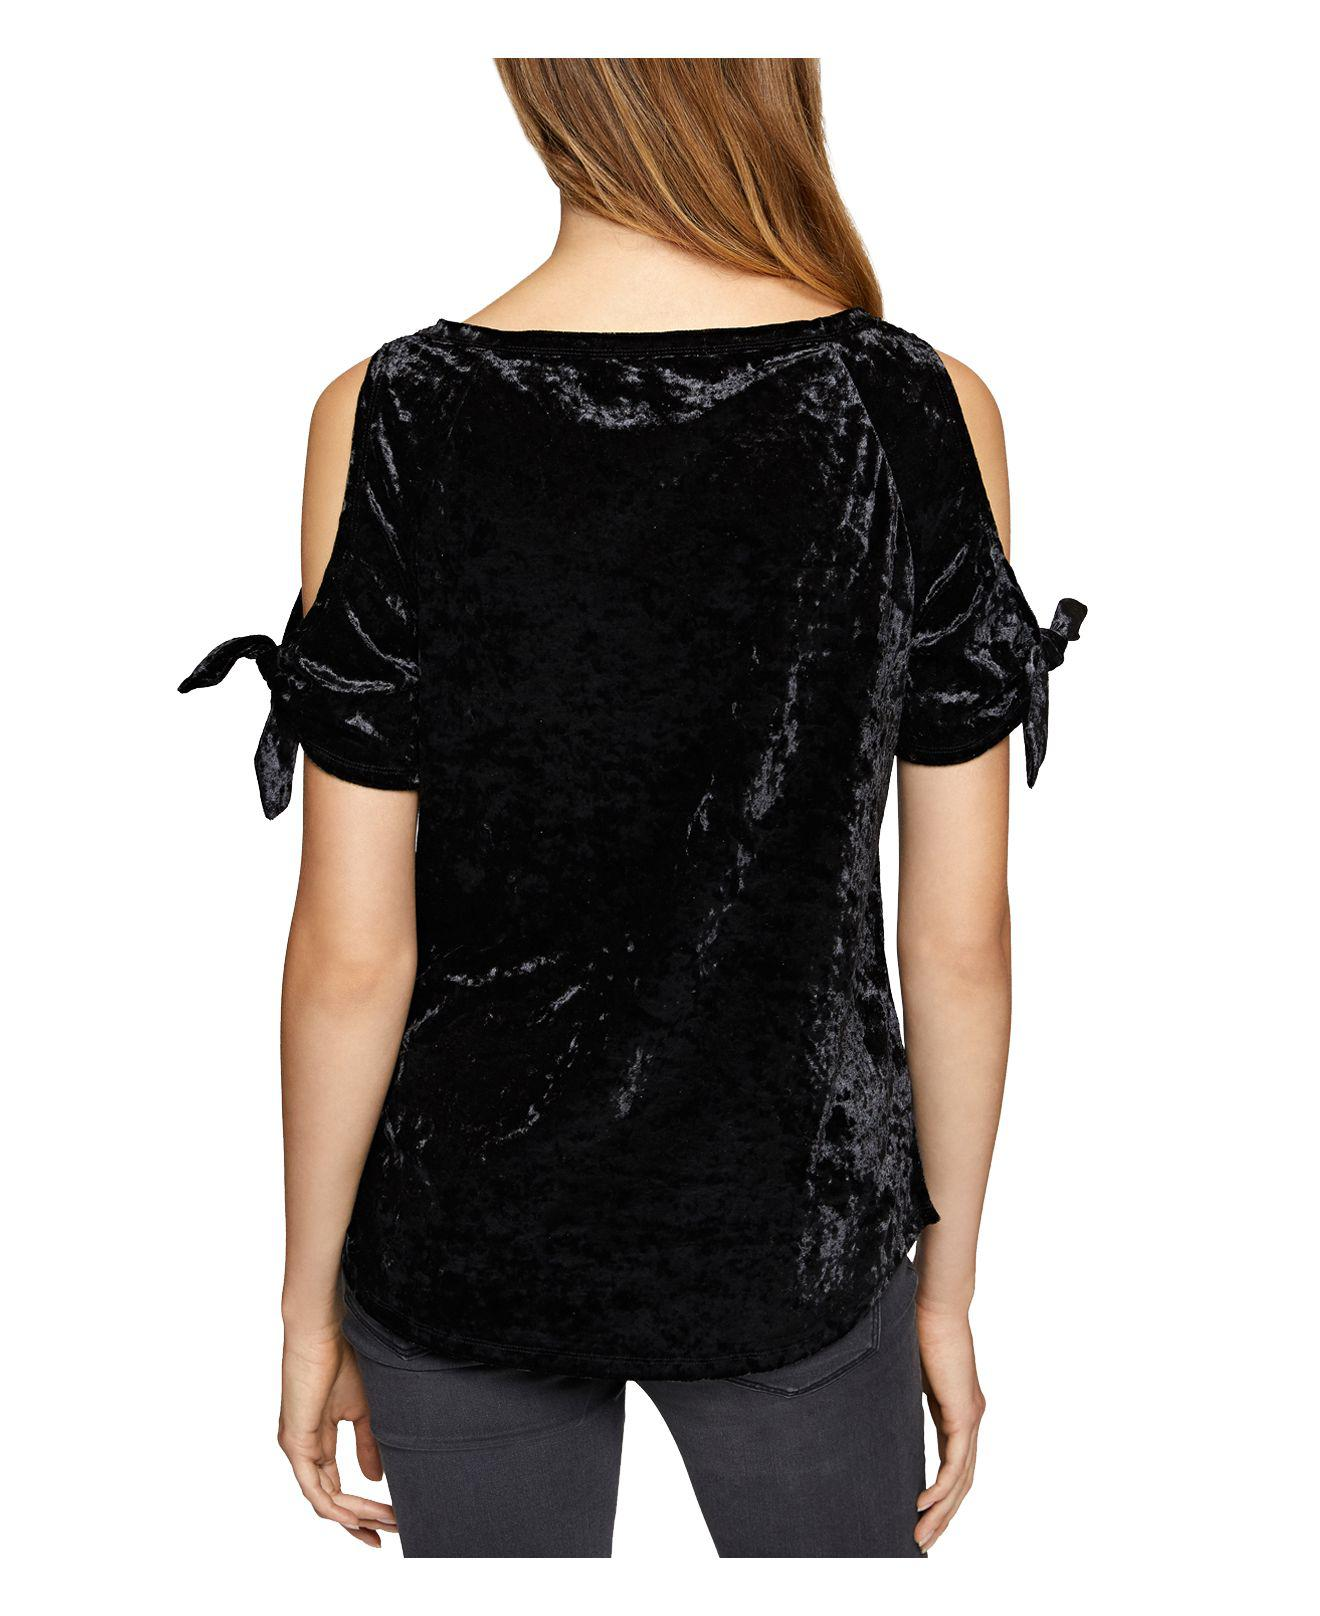 14a3ca2adefeb6 Lyst - Sanctuary Lou Lou Crushed Velvet Cold-shoulder Top in Black